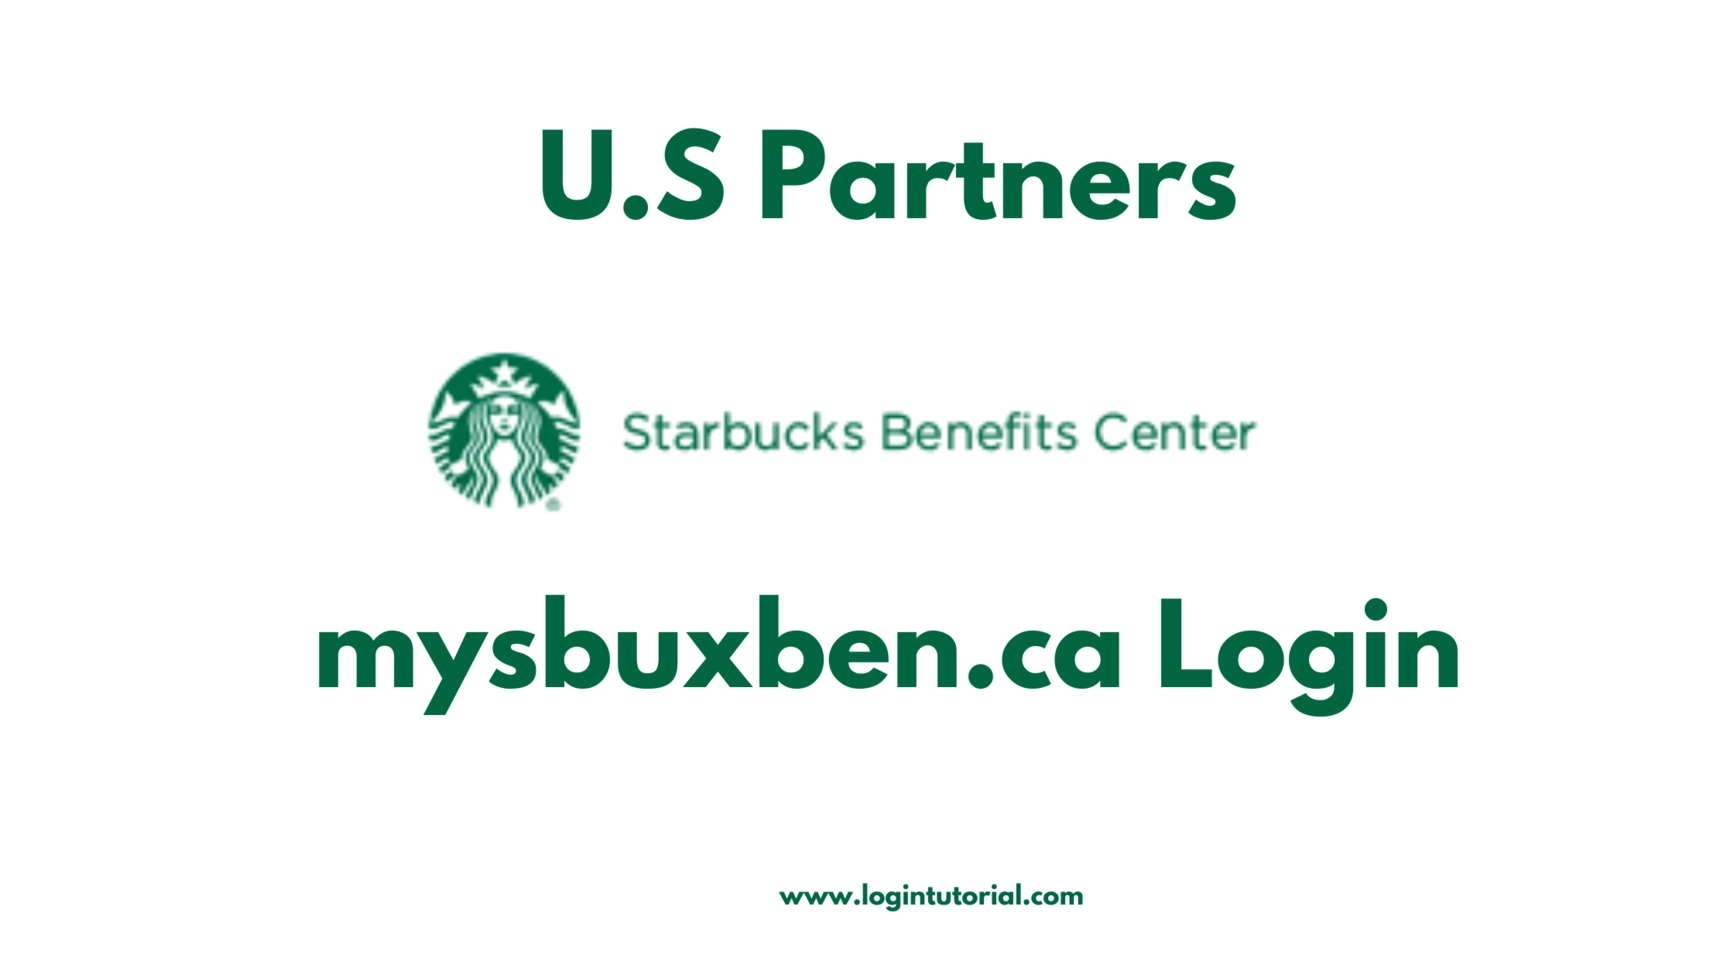 mysbuxben Login for US Partners